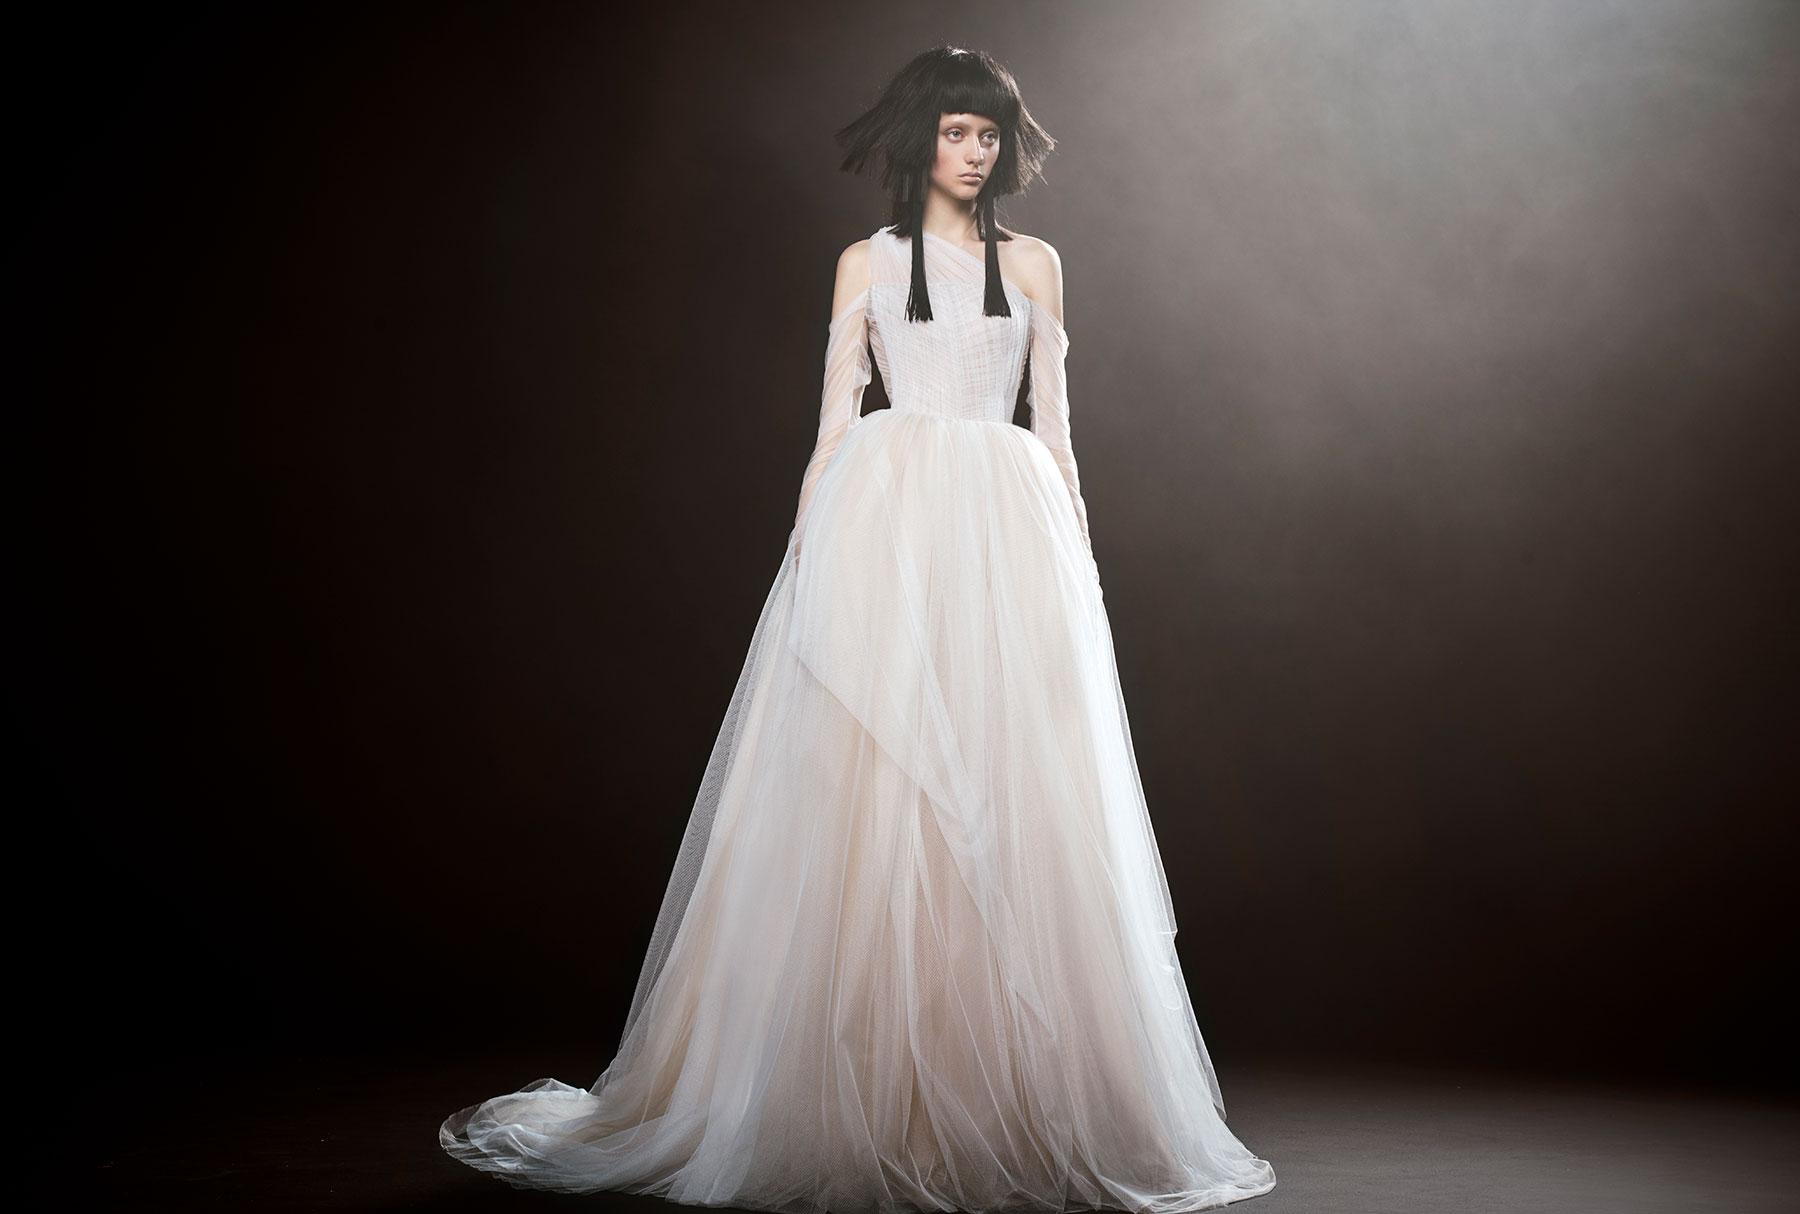 6fcd2bf7dc1b7 Vera Wang Bride | Musette Bridal Boutique